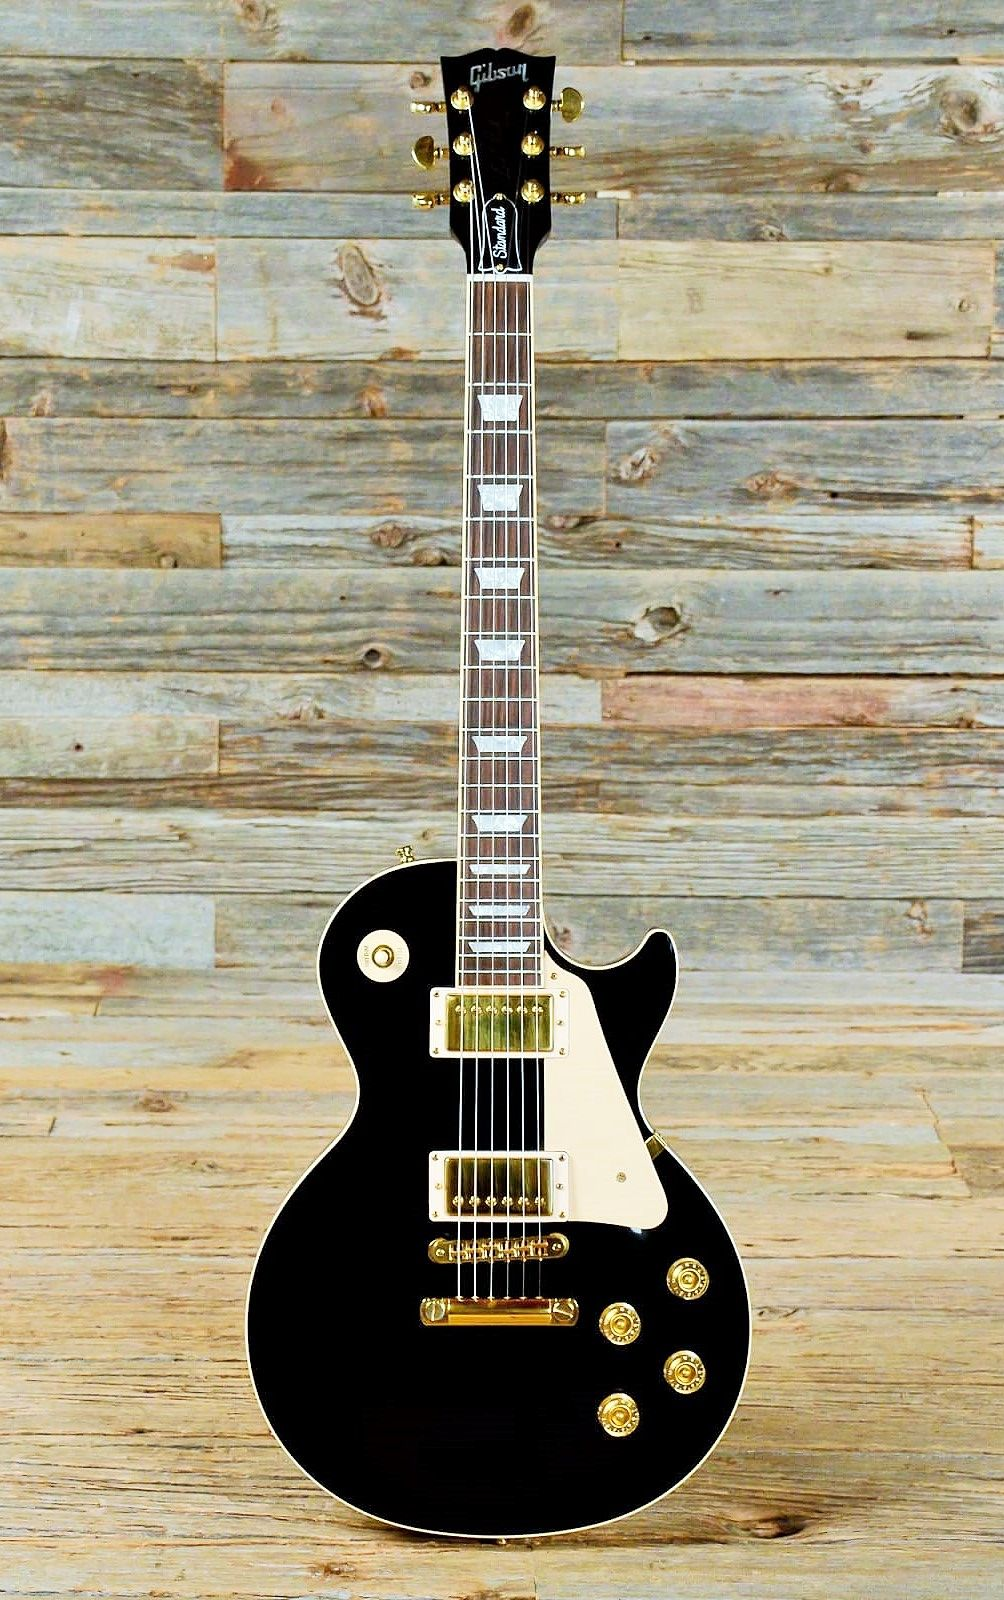 Gibson Les Paul Standard Ebony Guitar Lessons Guitar Guitar Pics